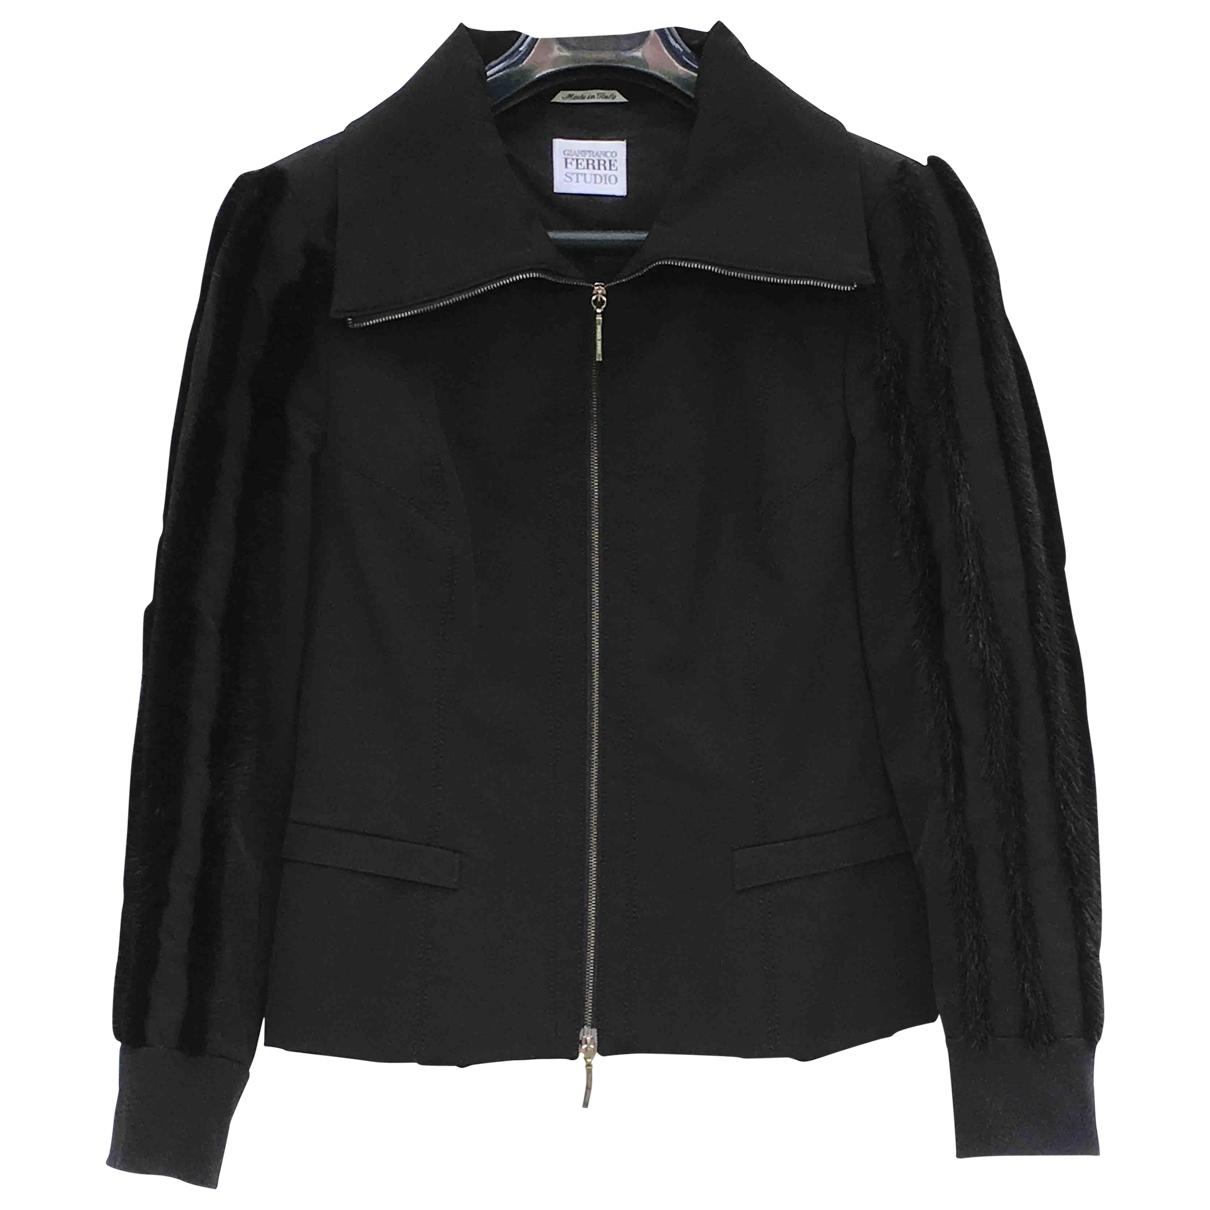 Gianfranco Ferré \N Black Leather jacket for Women 40 FR